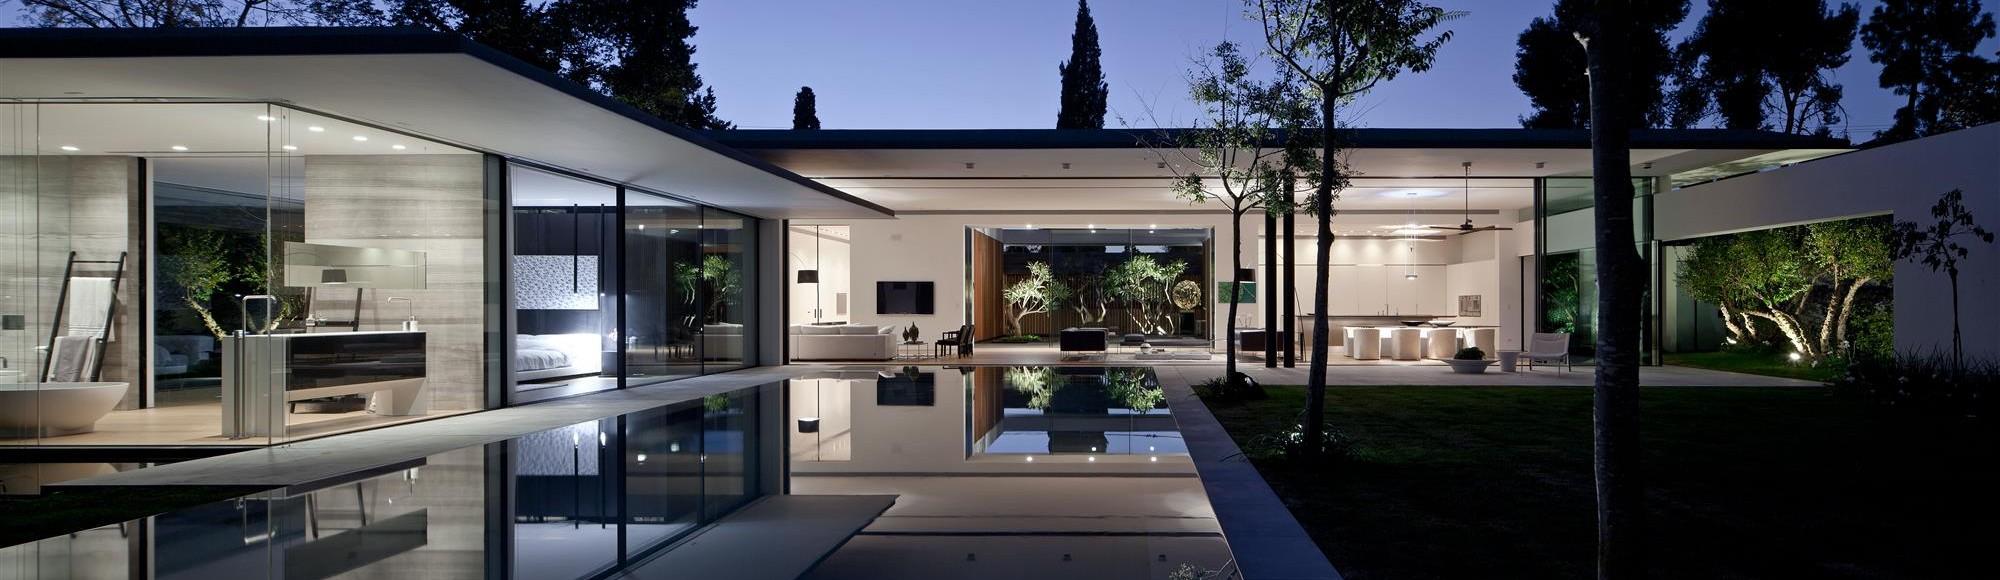 Design building guide for New dizain home